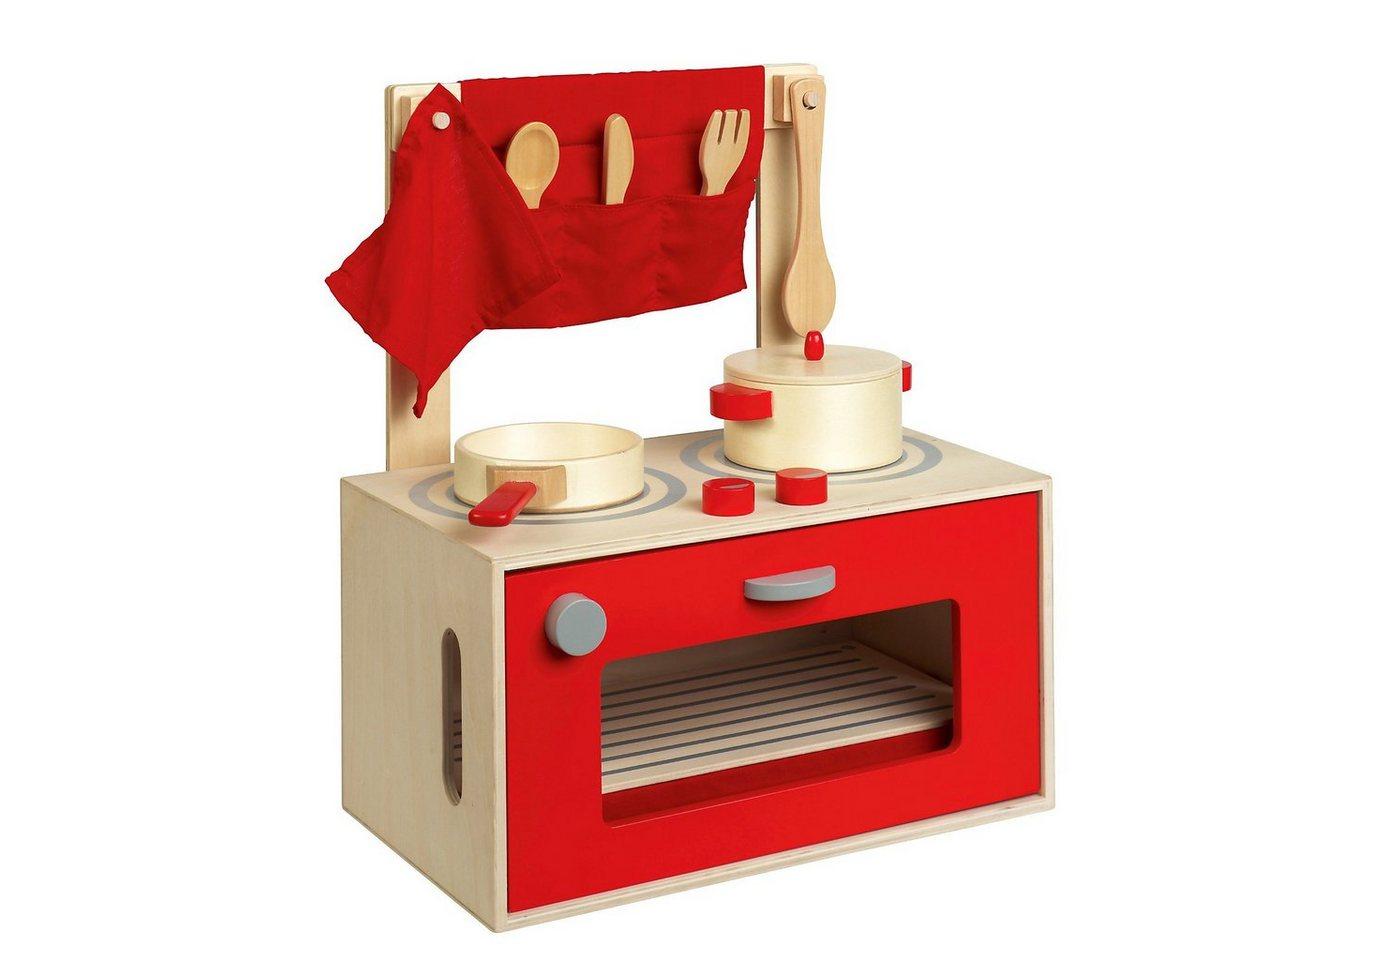 KUKY Holzspielküche Mini - Preisvergleich